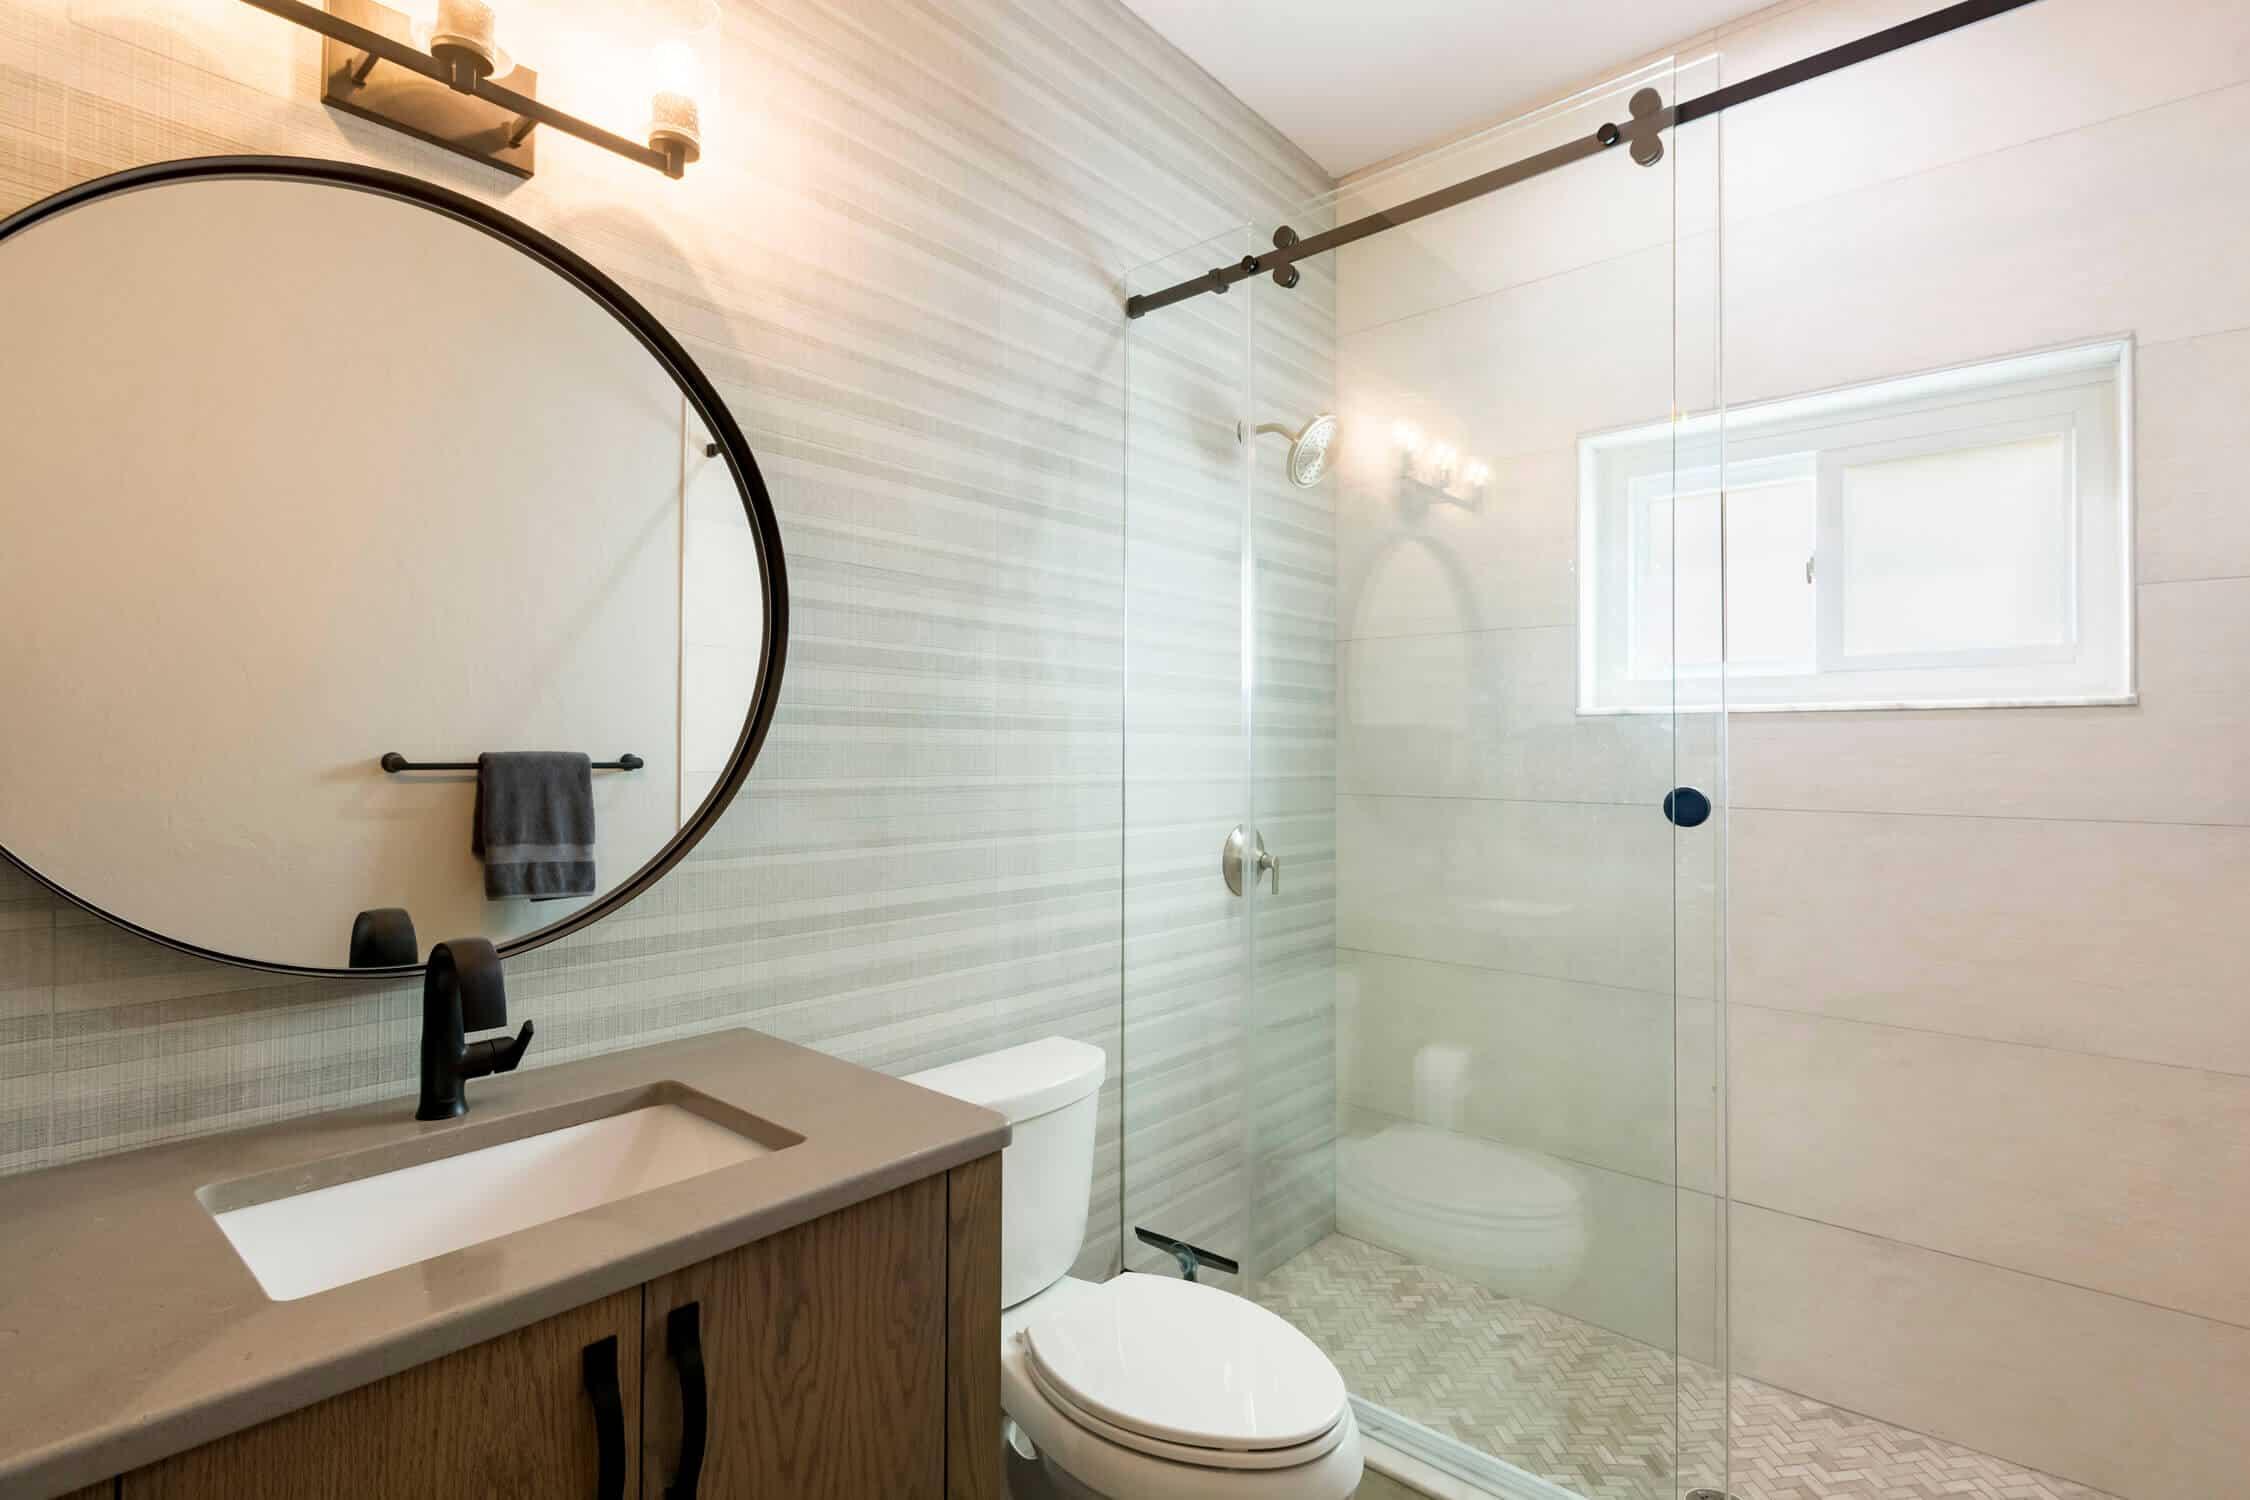 Bathroom featuring full wall tile